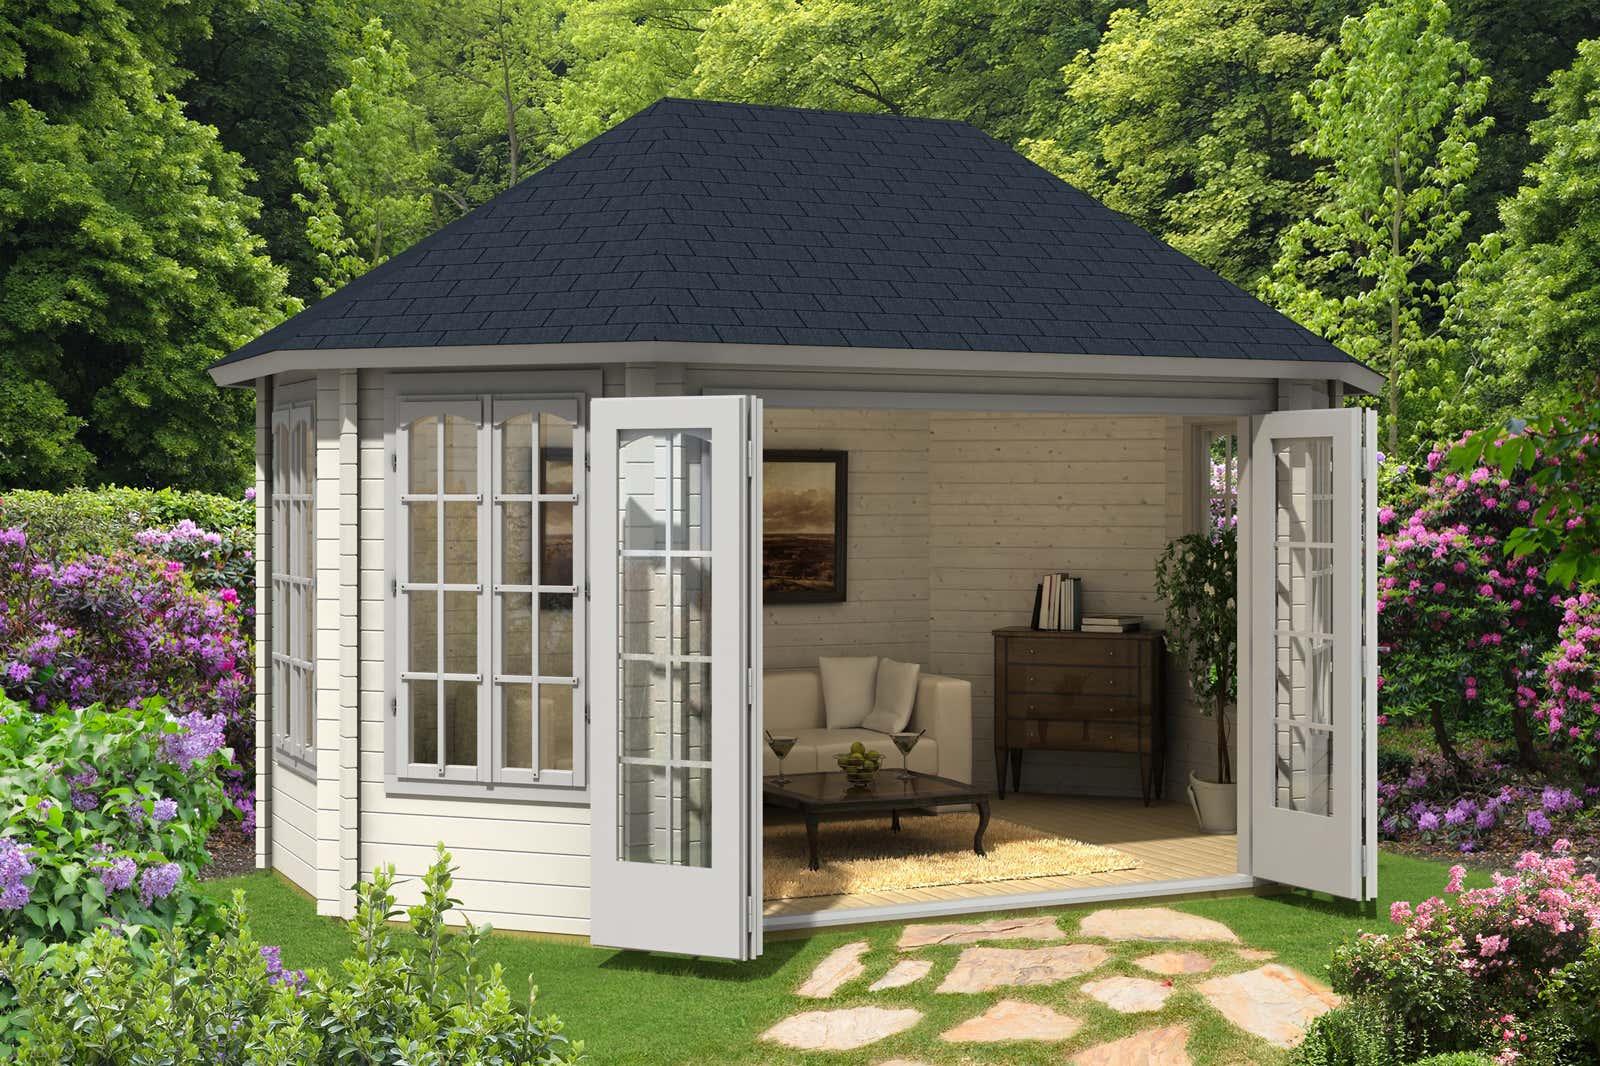 gartenpavillon gr nland 44 iso mit gro er faltt r a z gartenhaus gmbh. Black Bedroom Furniture Sets. Home Design Ideas